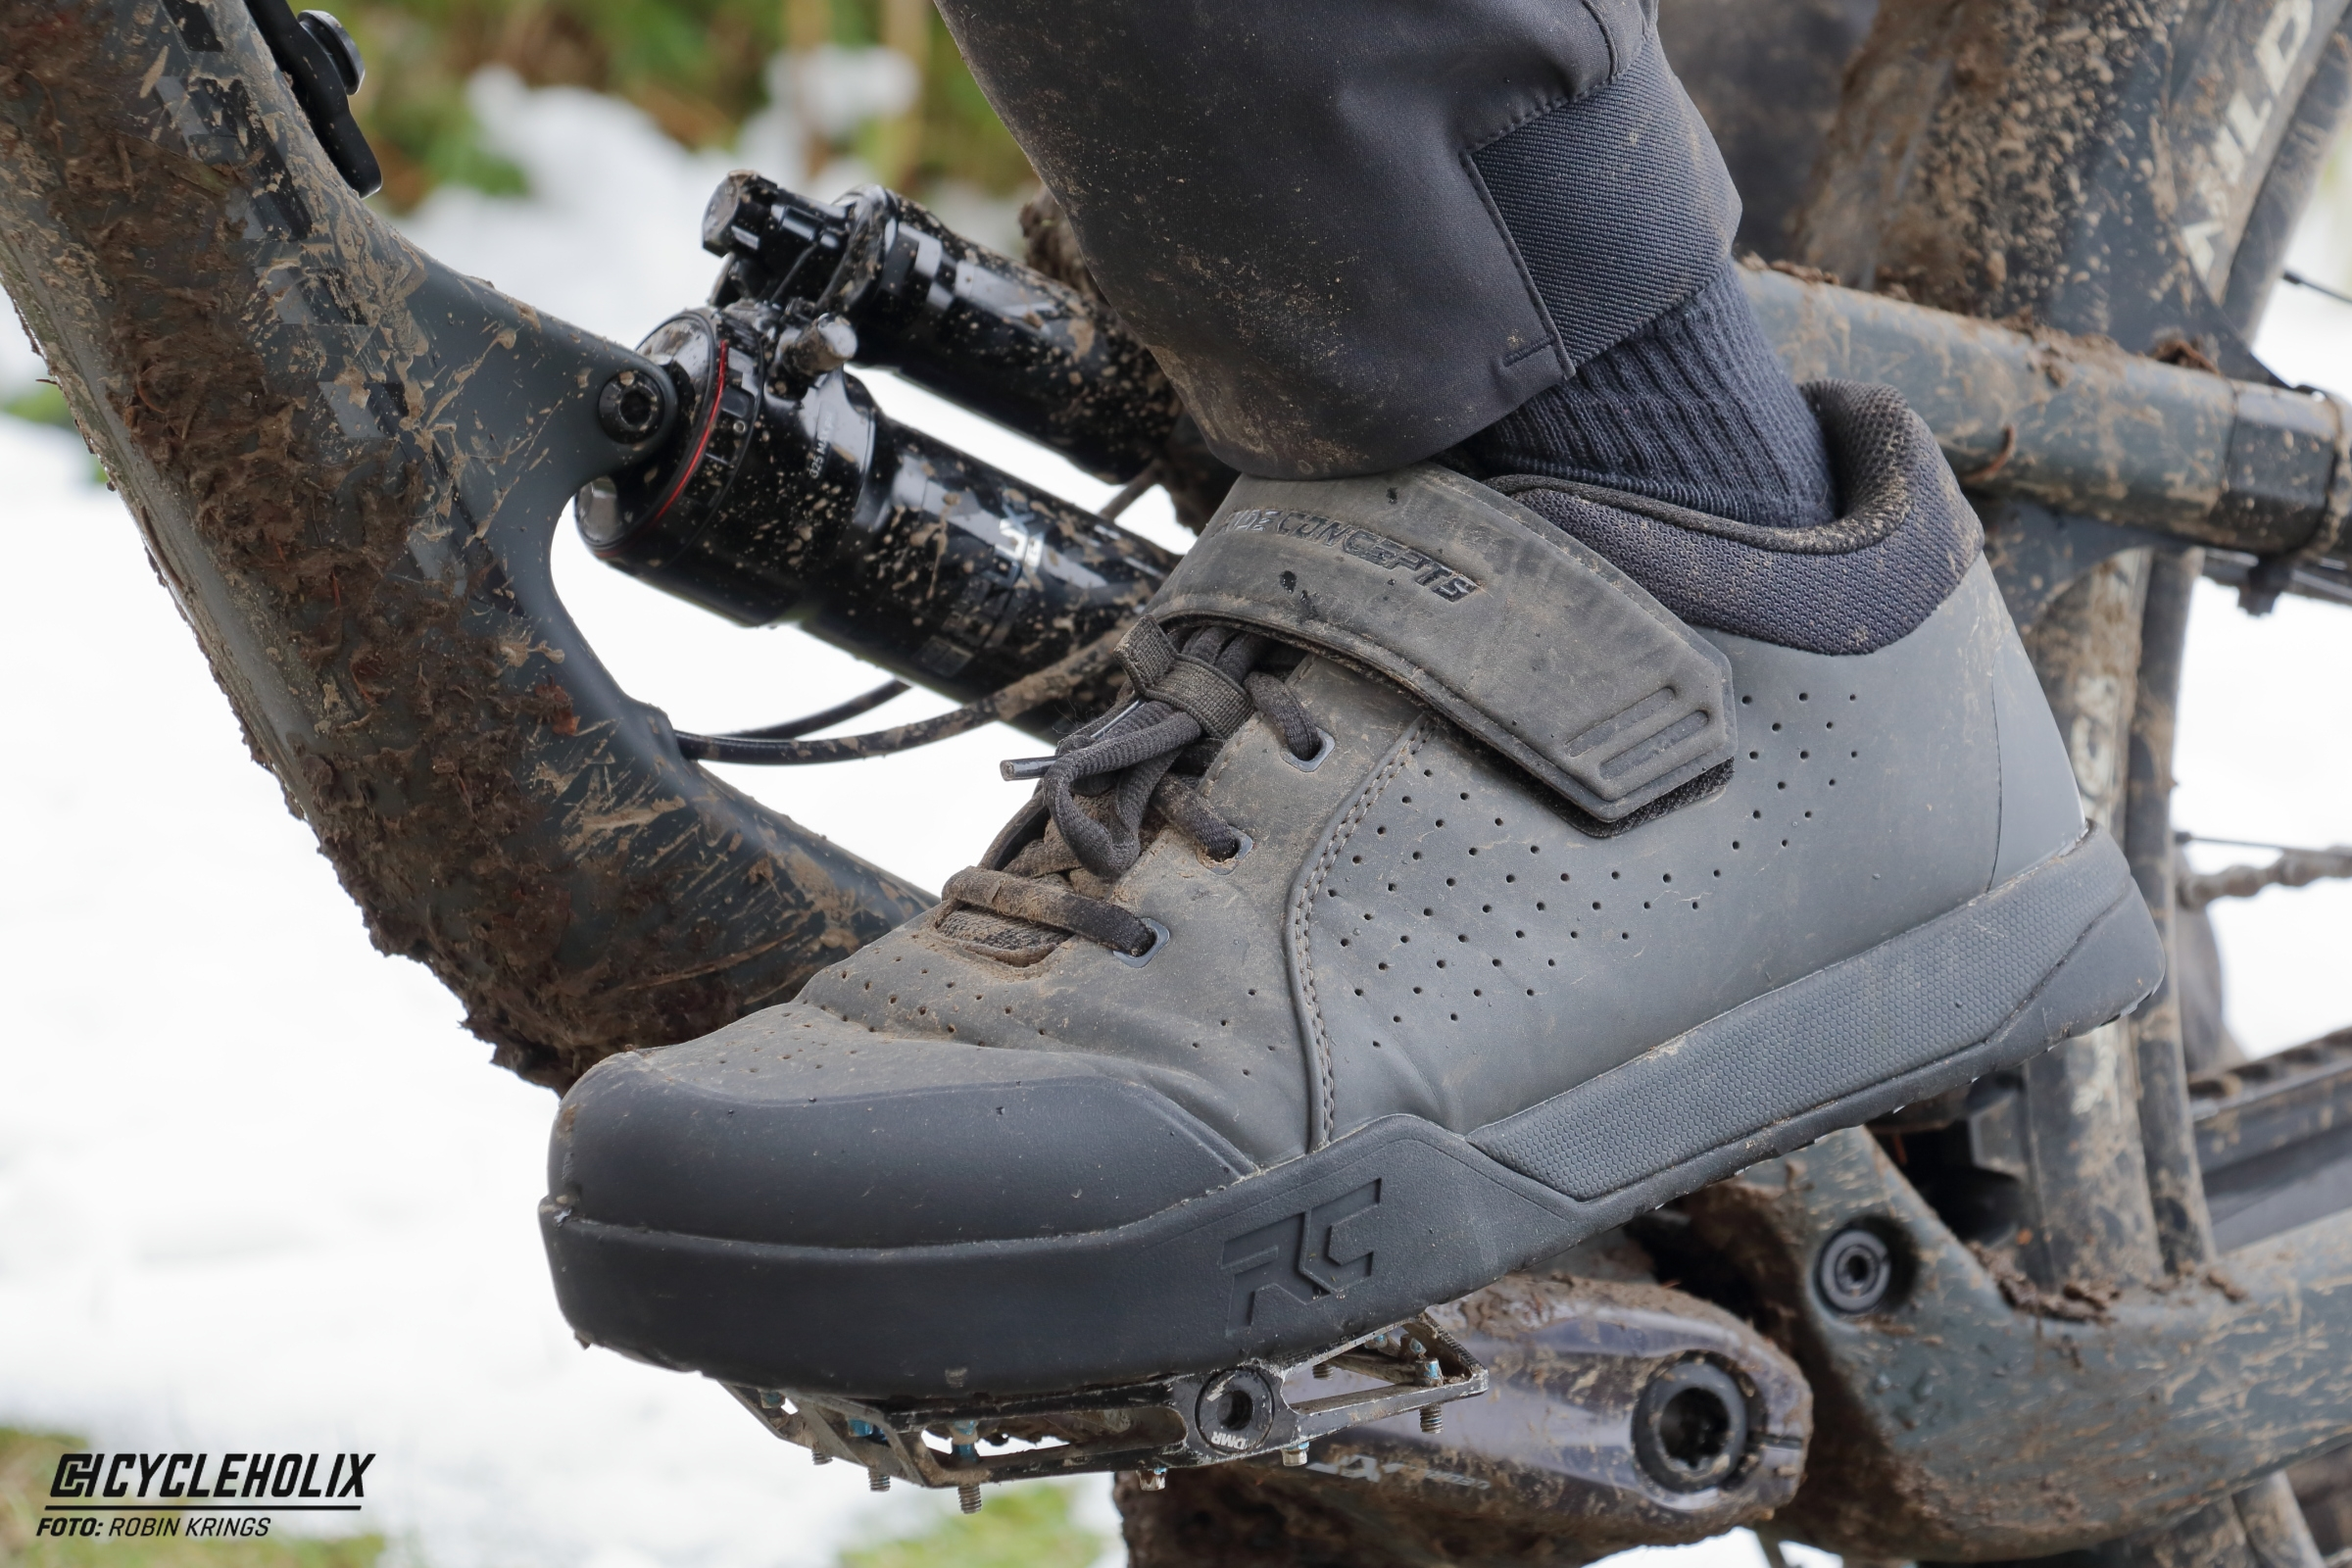 Ride Concepts TNT - Cycleholix_Pedal2